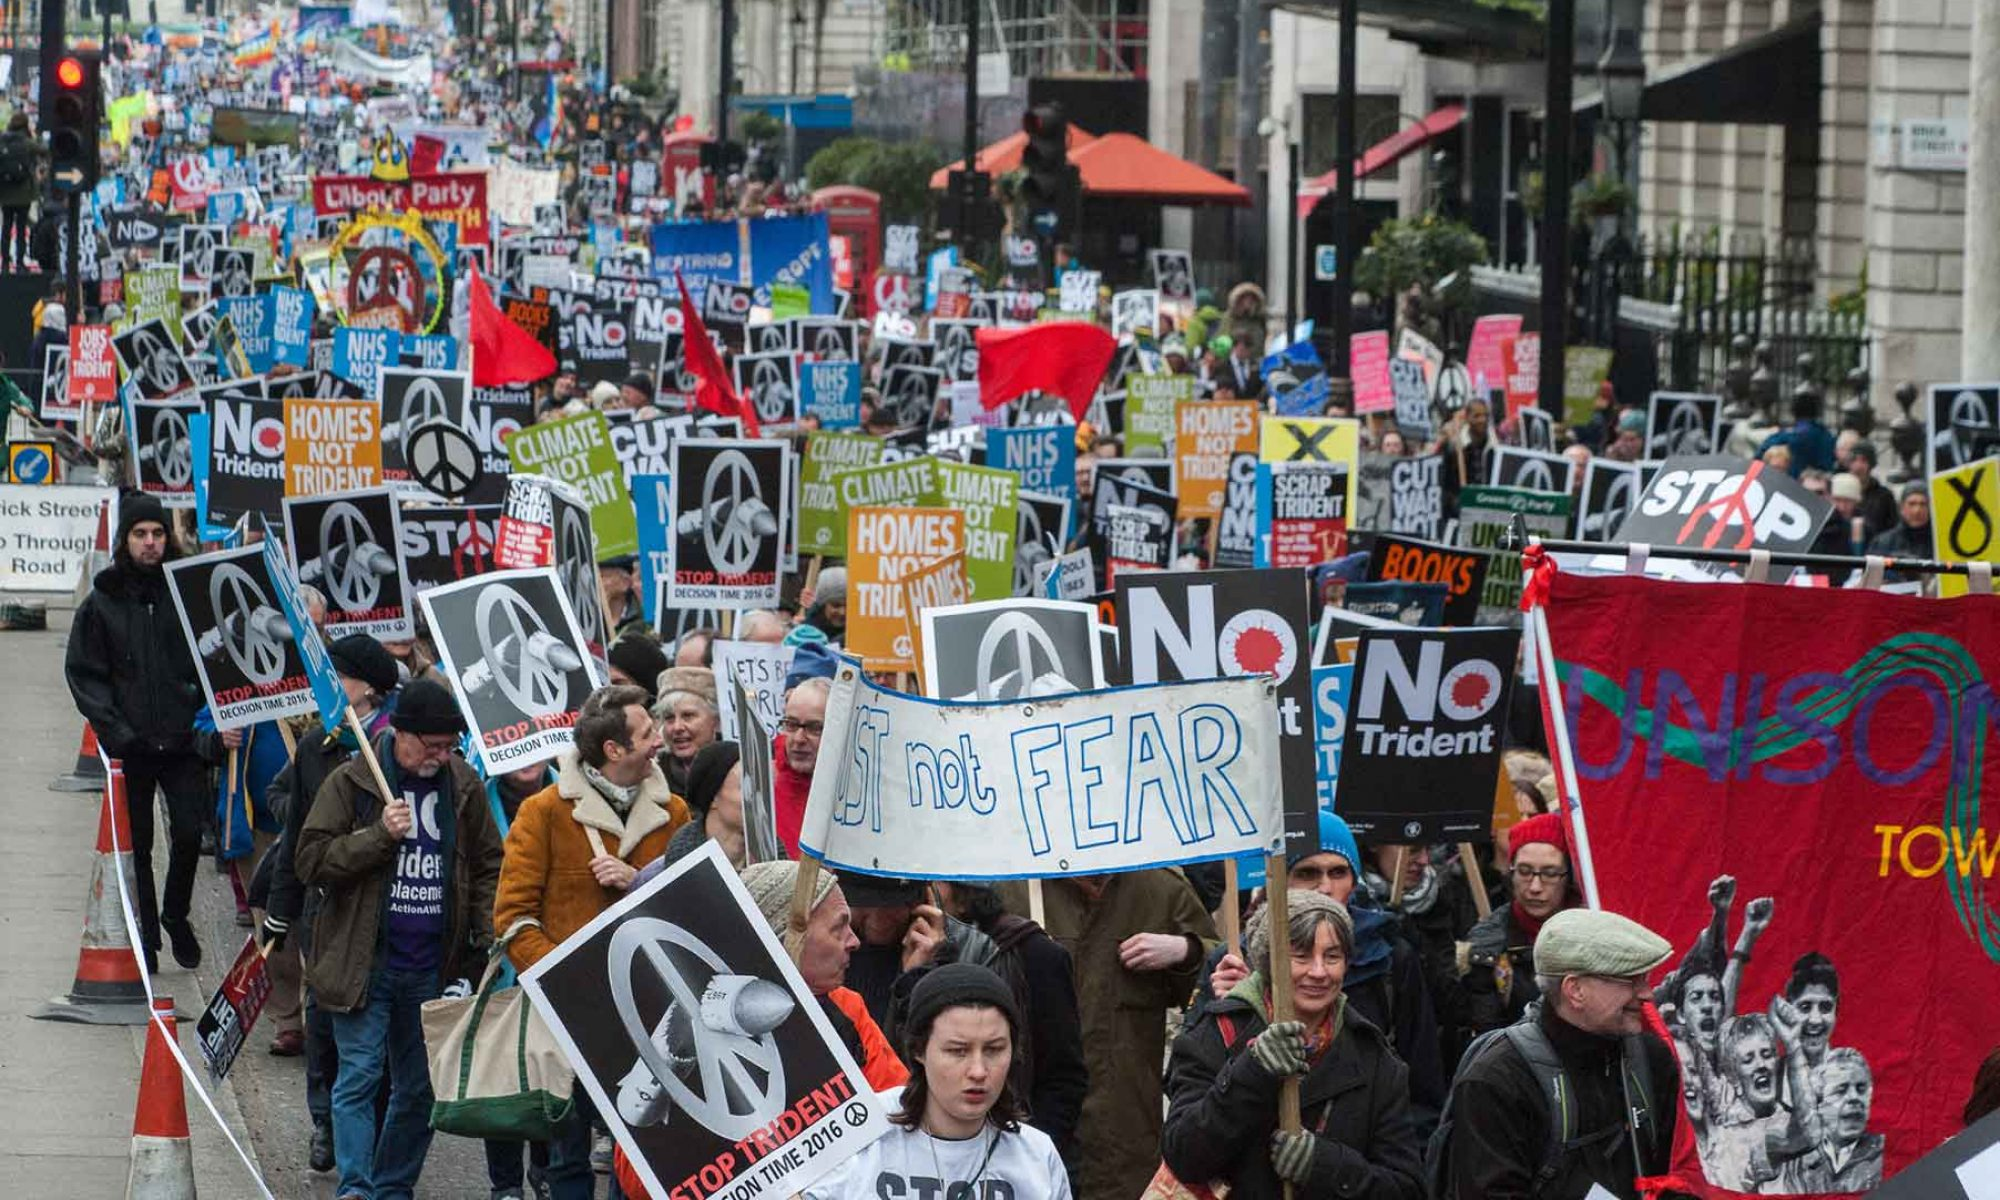 Labour Campaign for Nuclear Disarmament